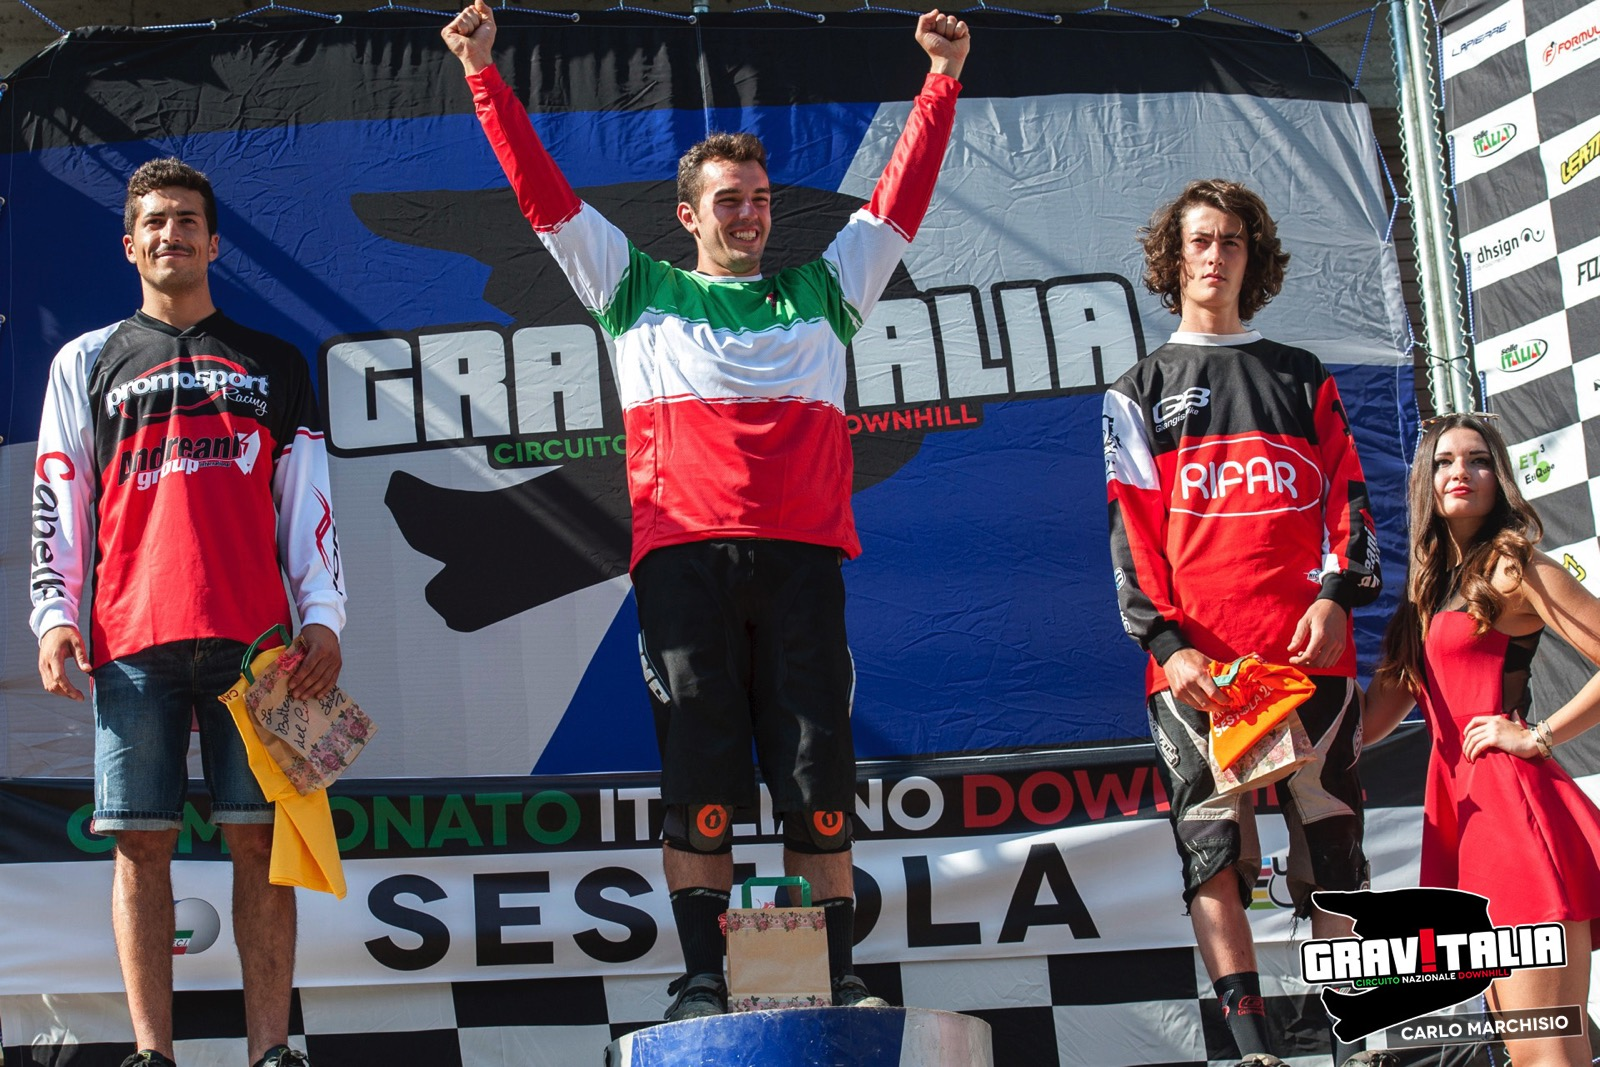 PhotoCarloMarchisio_GIT2015_CampionatiItaliani_Sestola_064